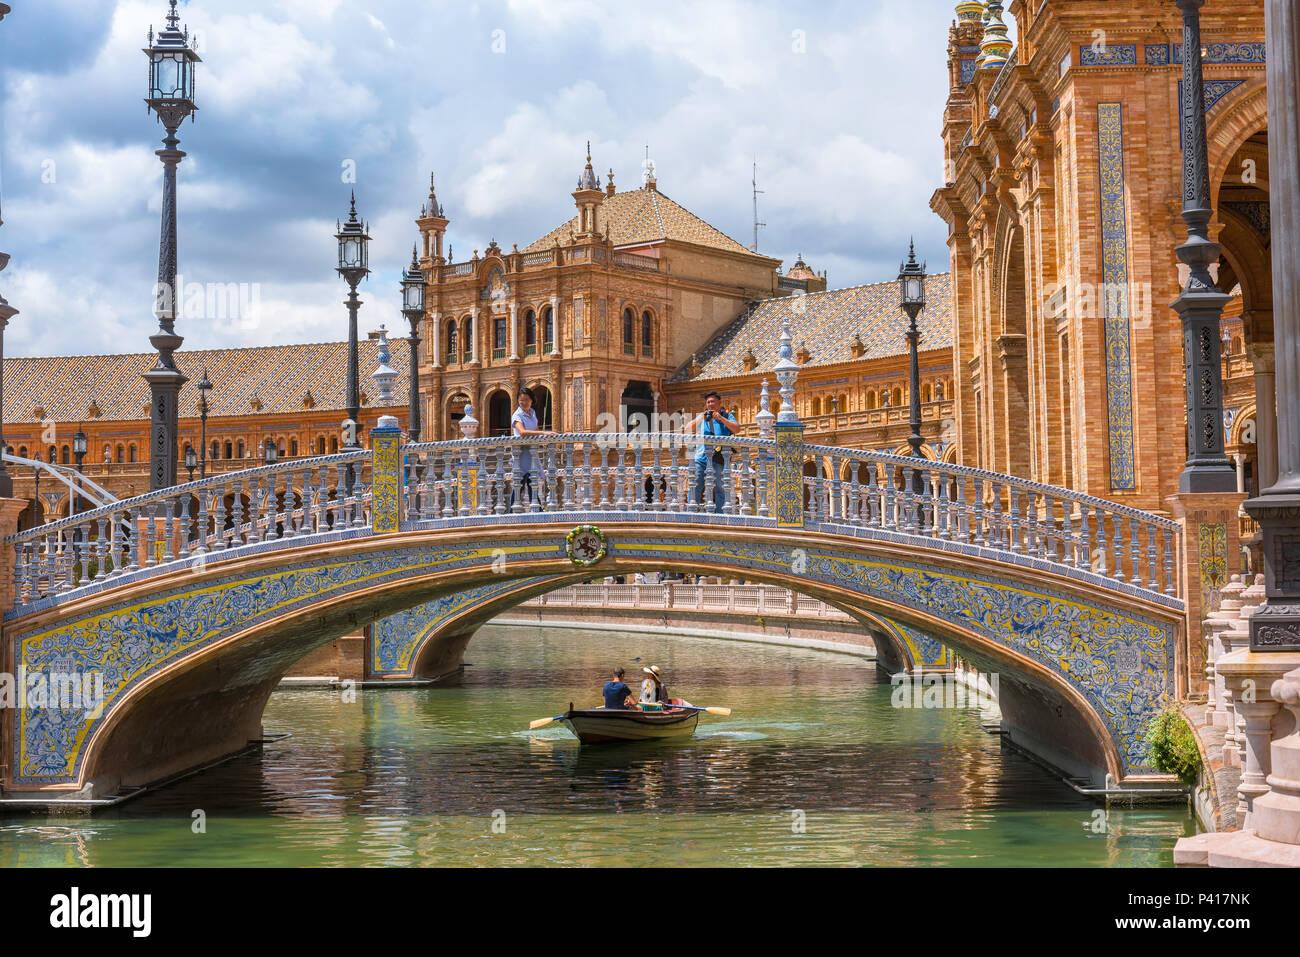 Seville Plaza de Espana, view of a colorful azulejo decorated bridge spanning the boating lake in the Plaza de Espana in Seville, Andalucia, Spain. - Stock Image